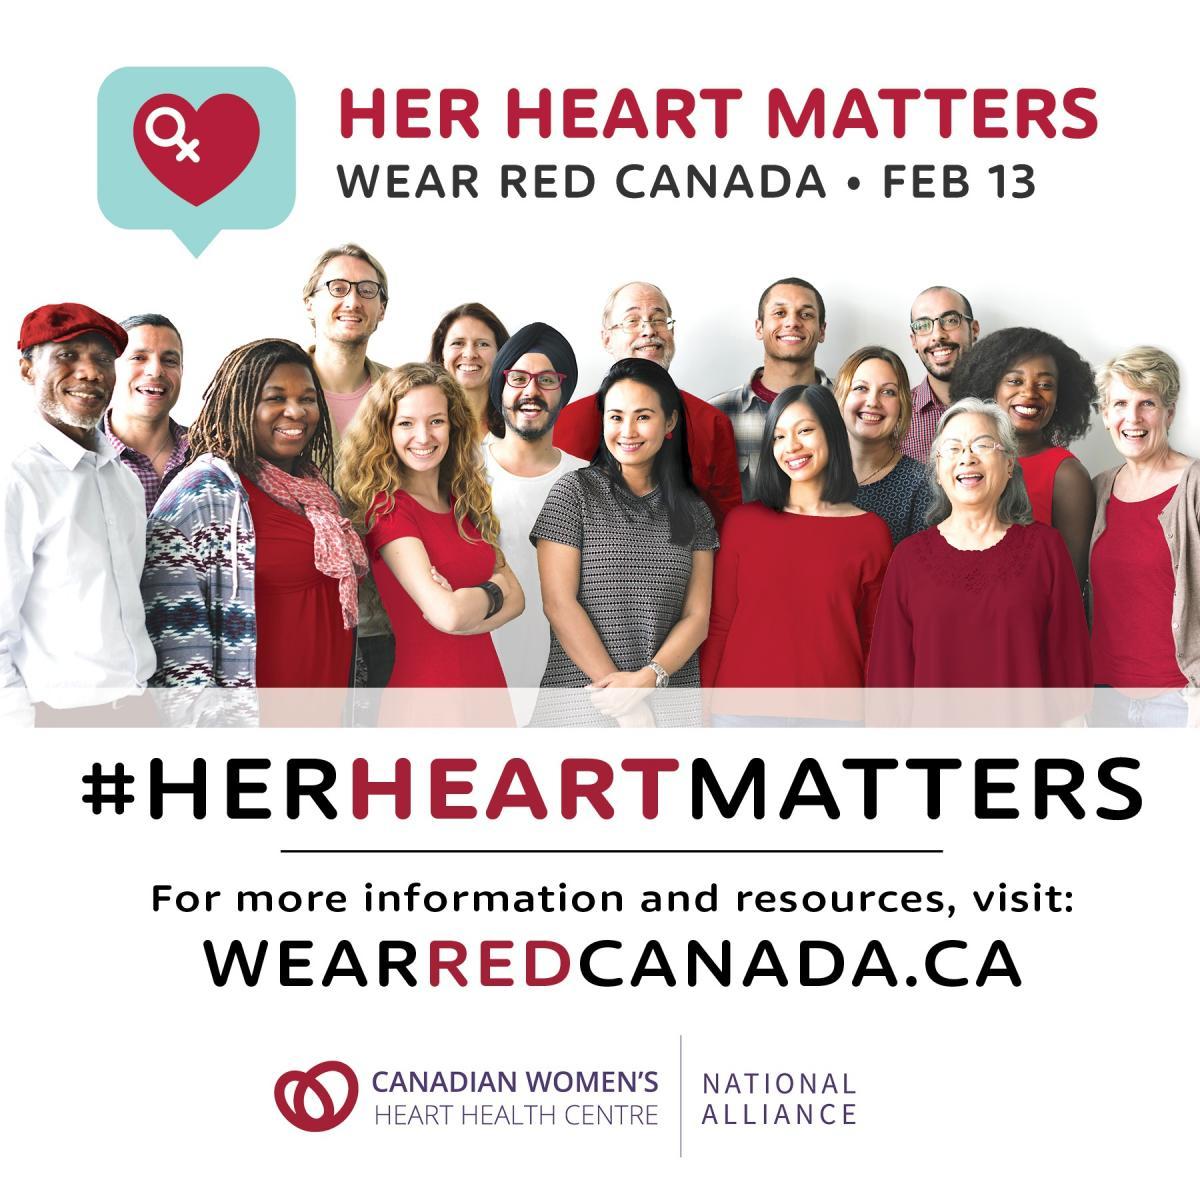 Leslie Diamond Women's Heart Health Clinic (@Women__Heart) on Twitter photo 17/01/2020 17:13:36